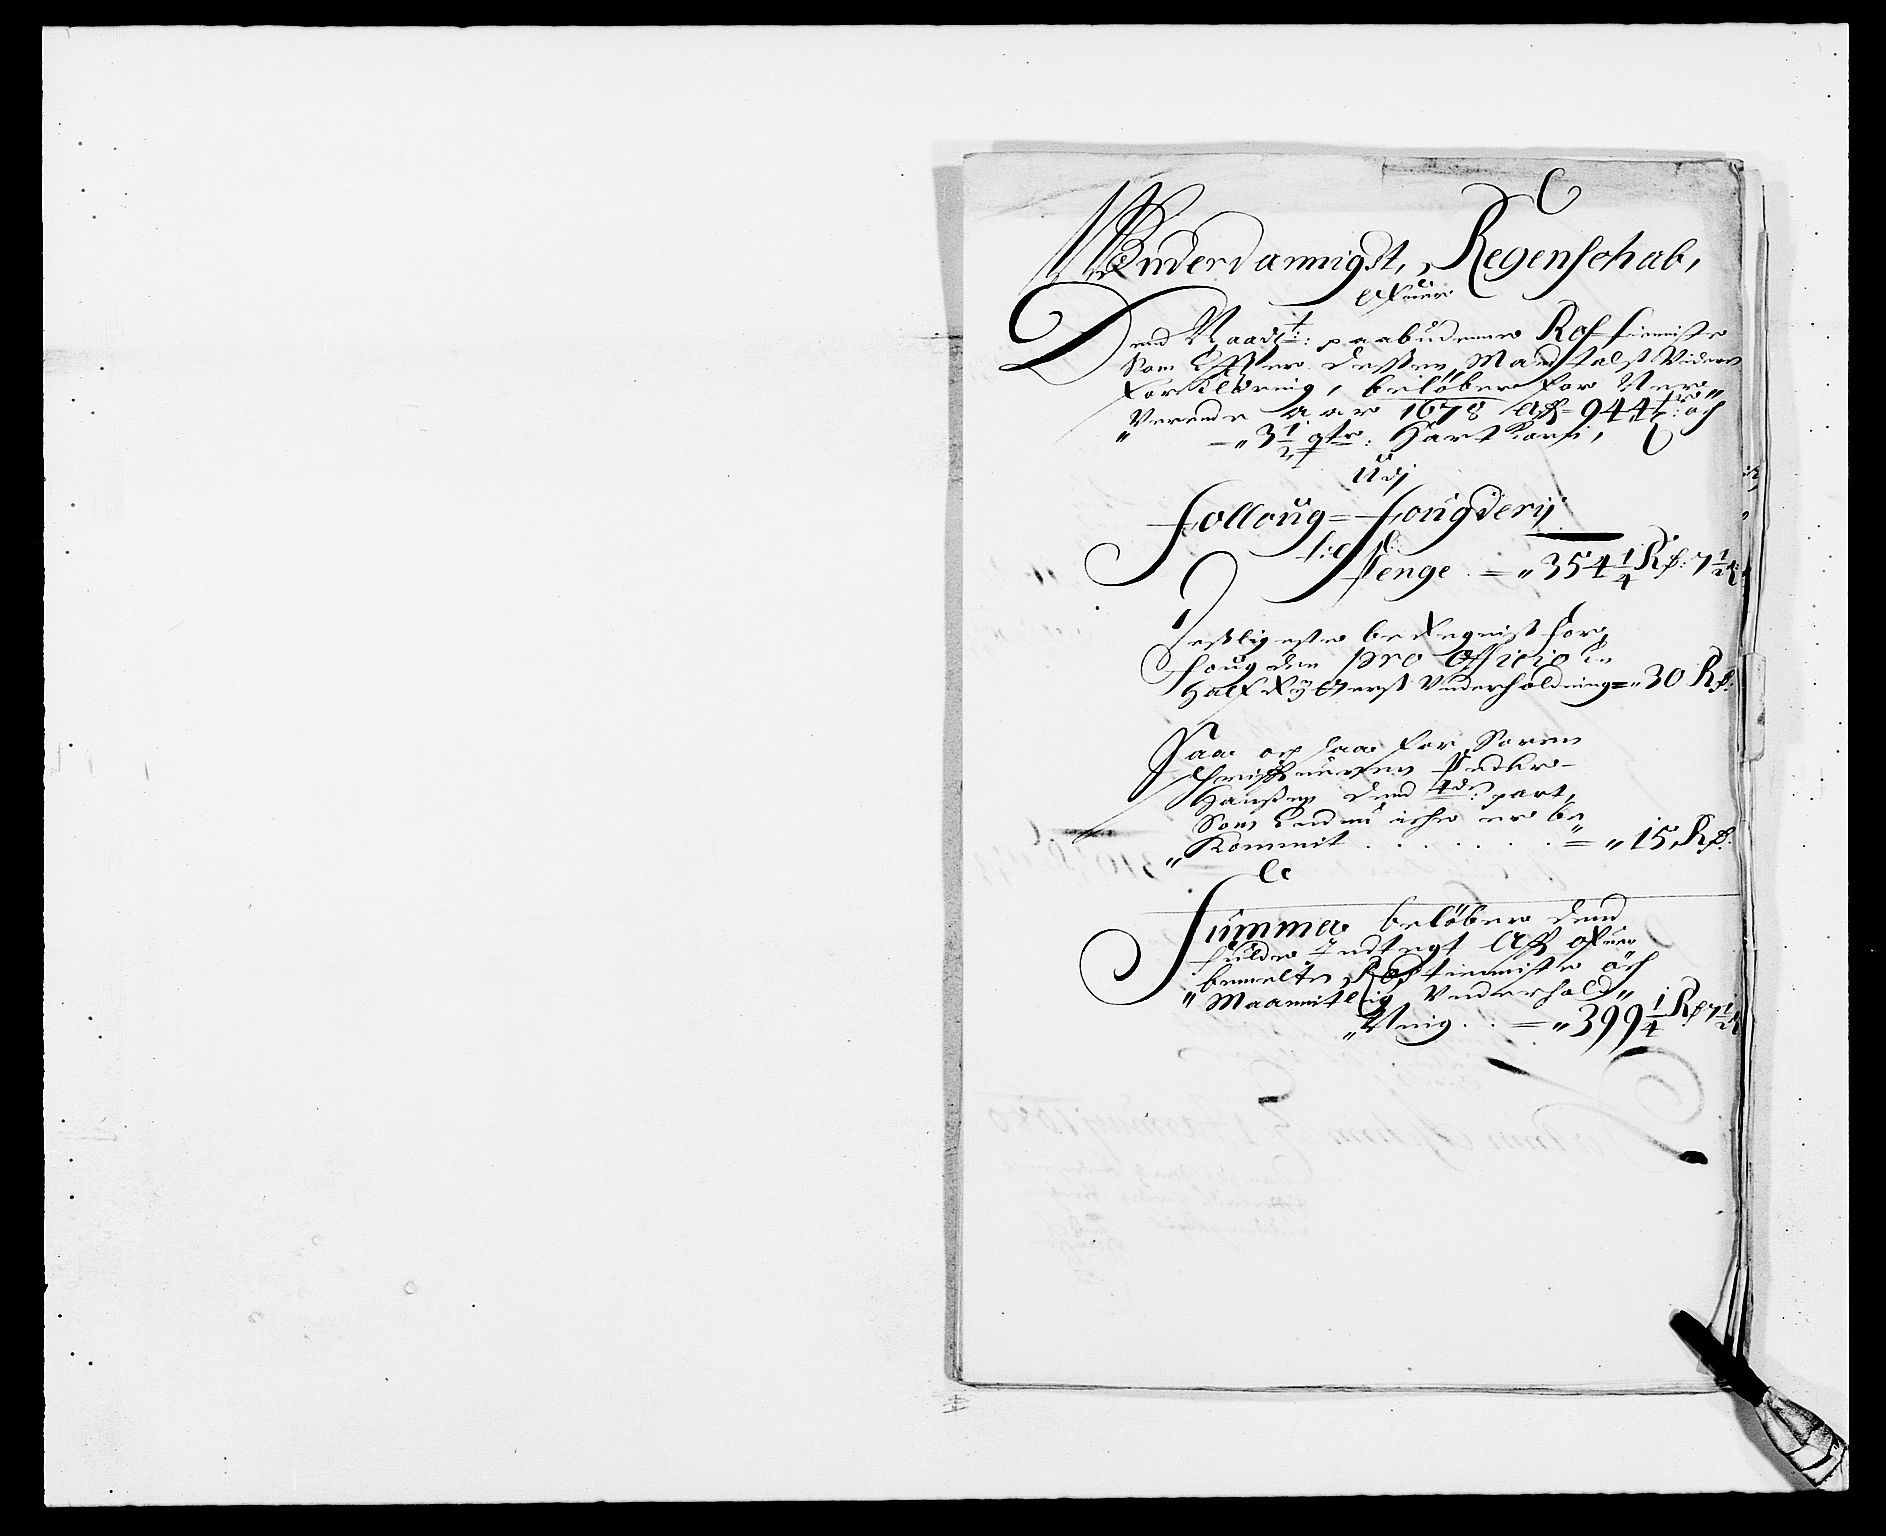 RA, Rentekammeret inntil 1814, Reviderte regnskaper, Fogderegnskap, R09/L0427: Fogderegnskap Follo, 1678, s. 247